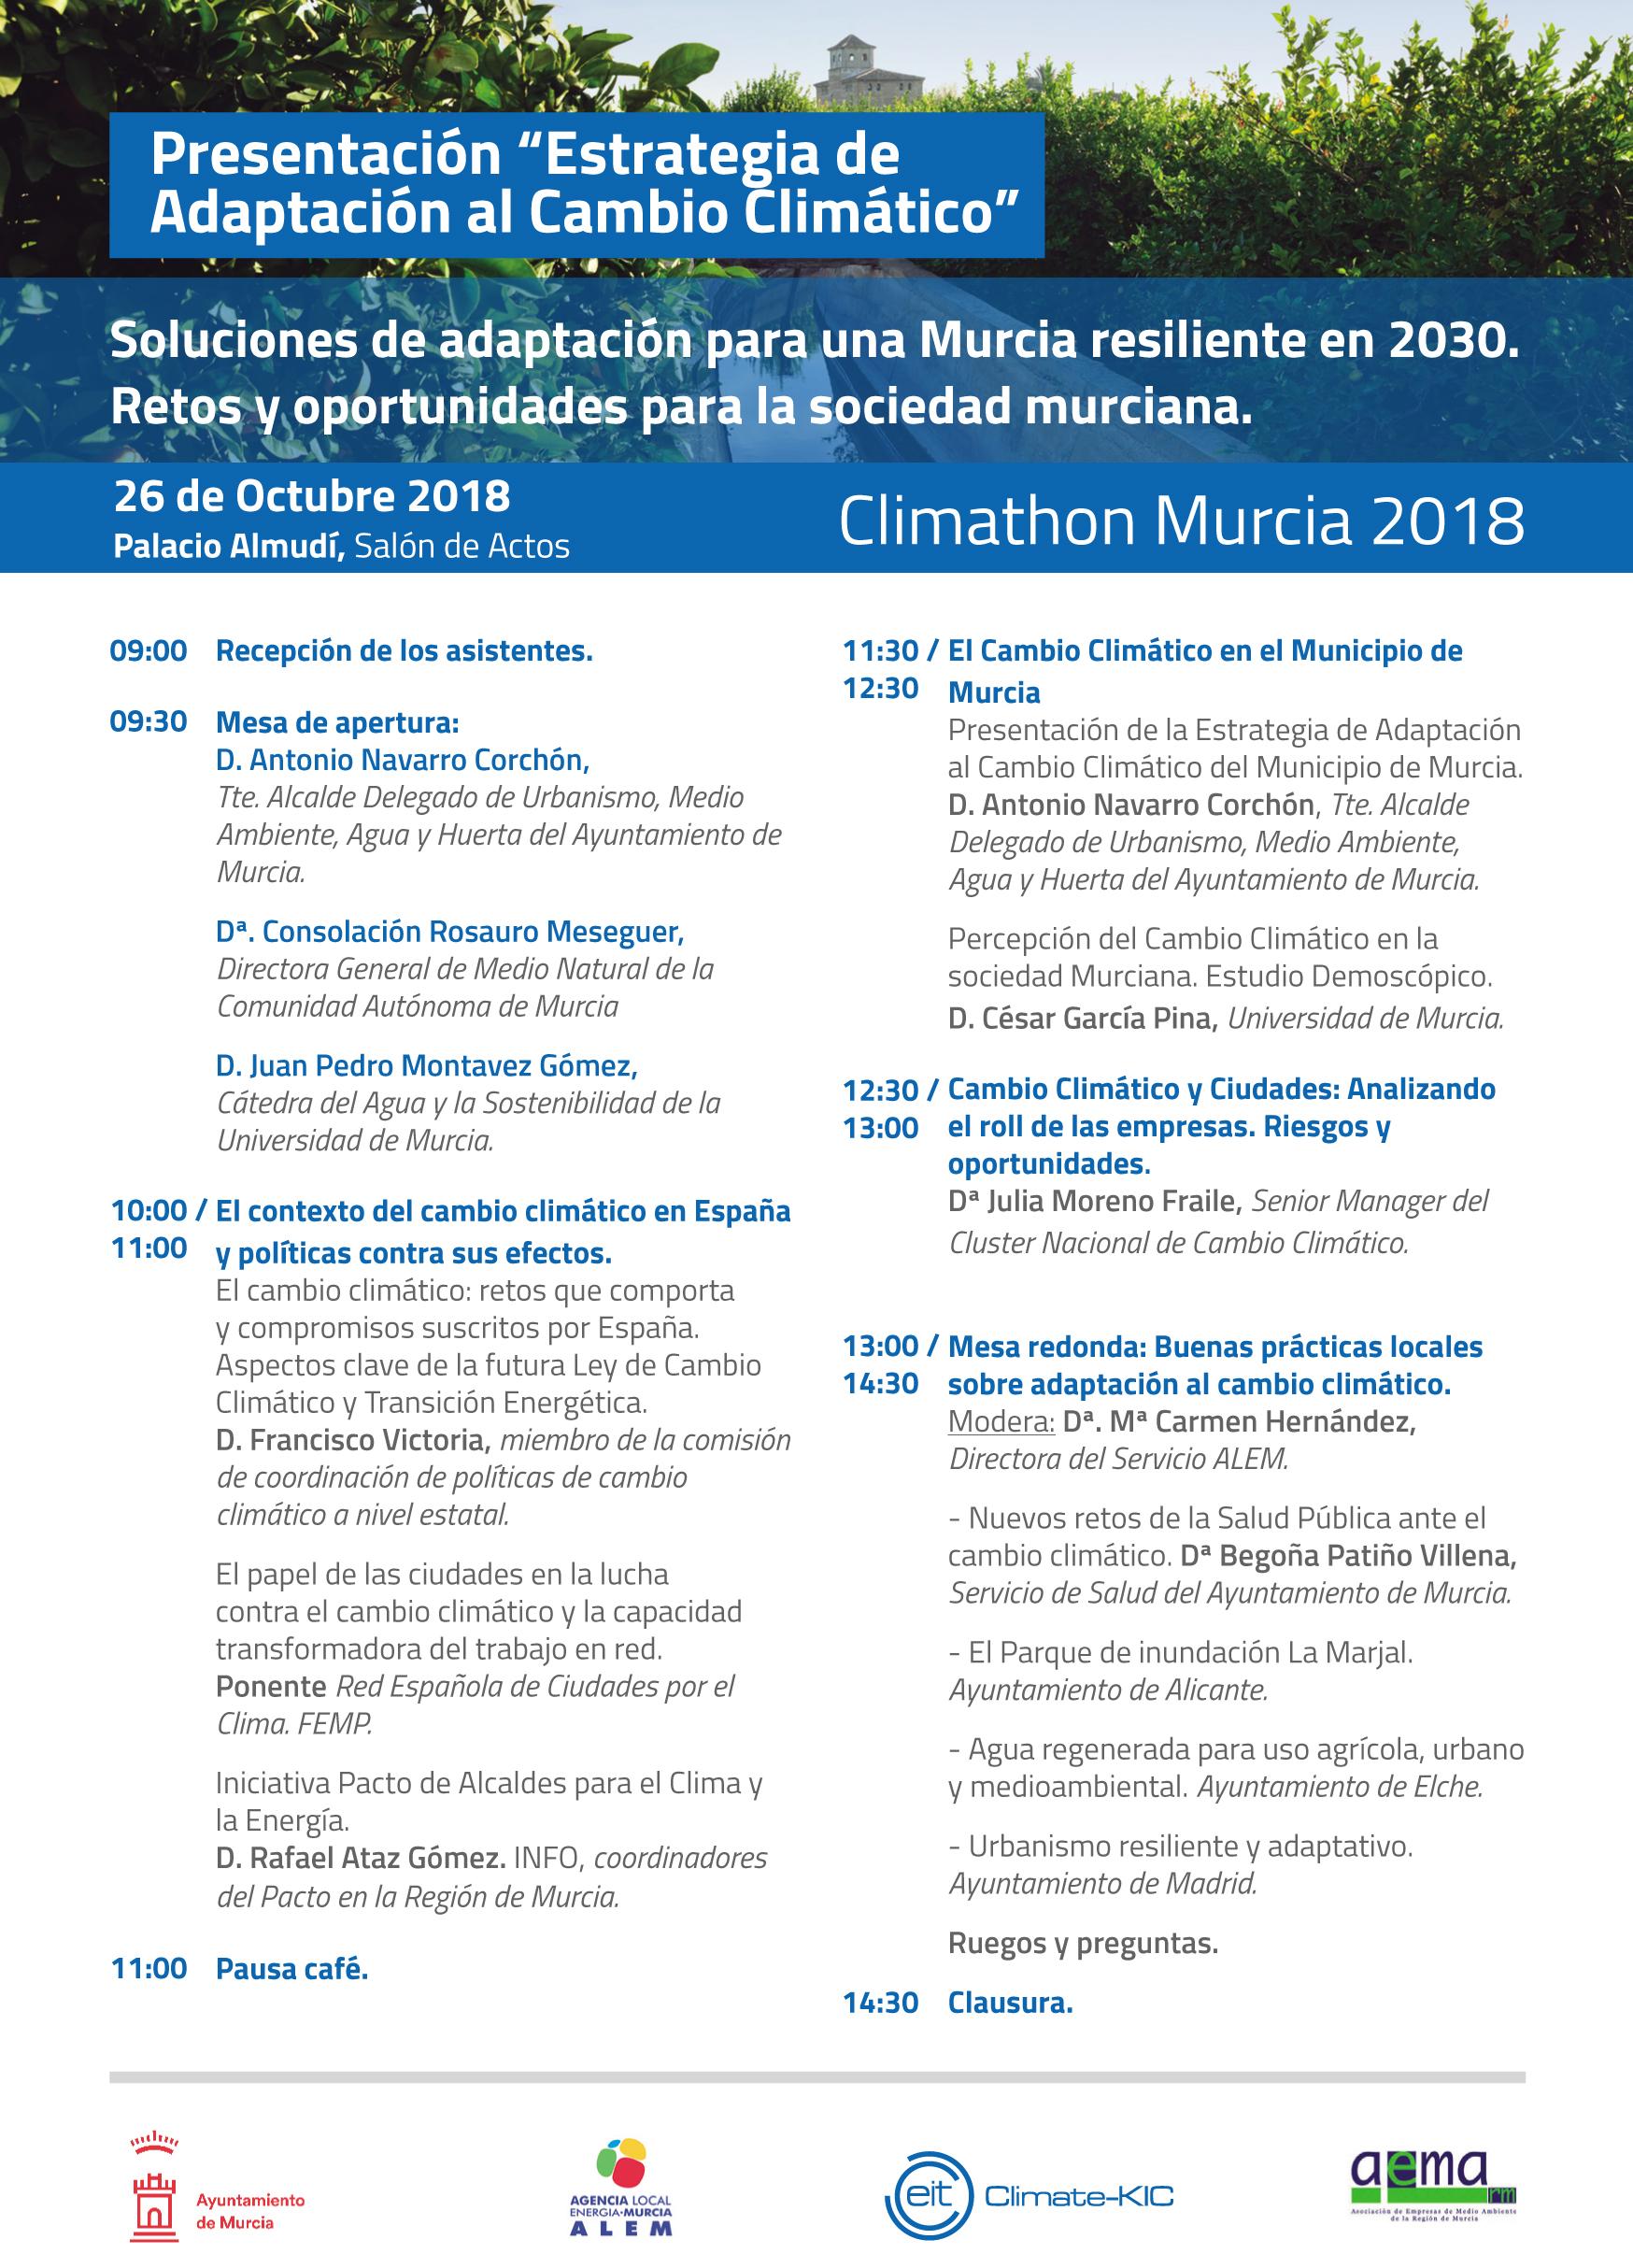 Programa Climathon Murcia 2018